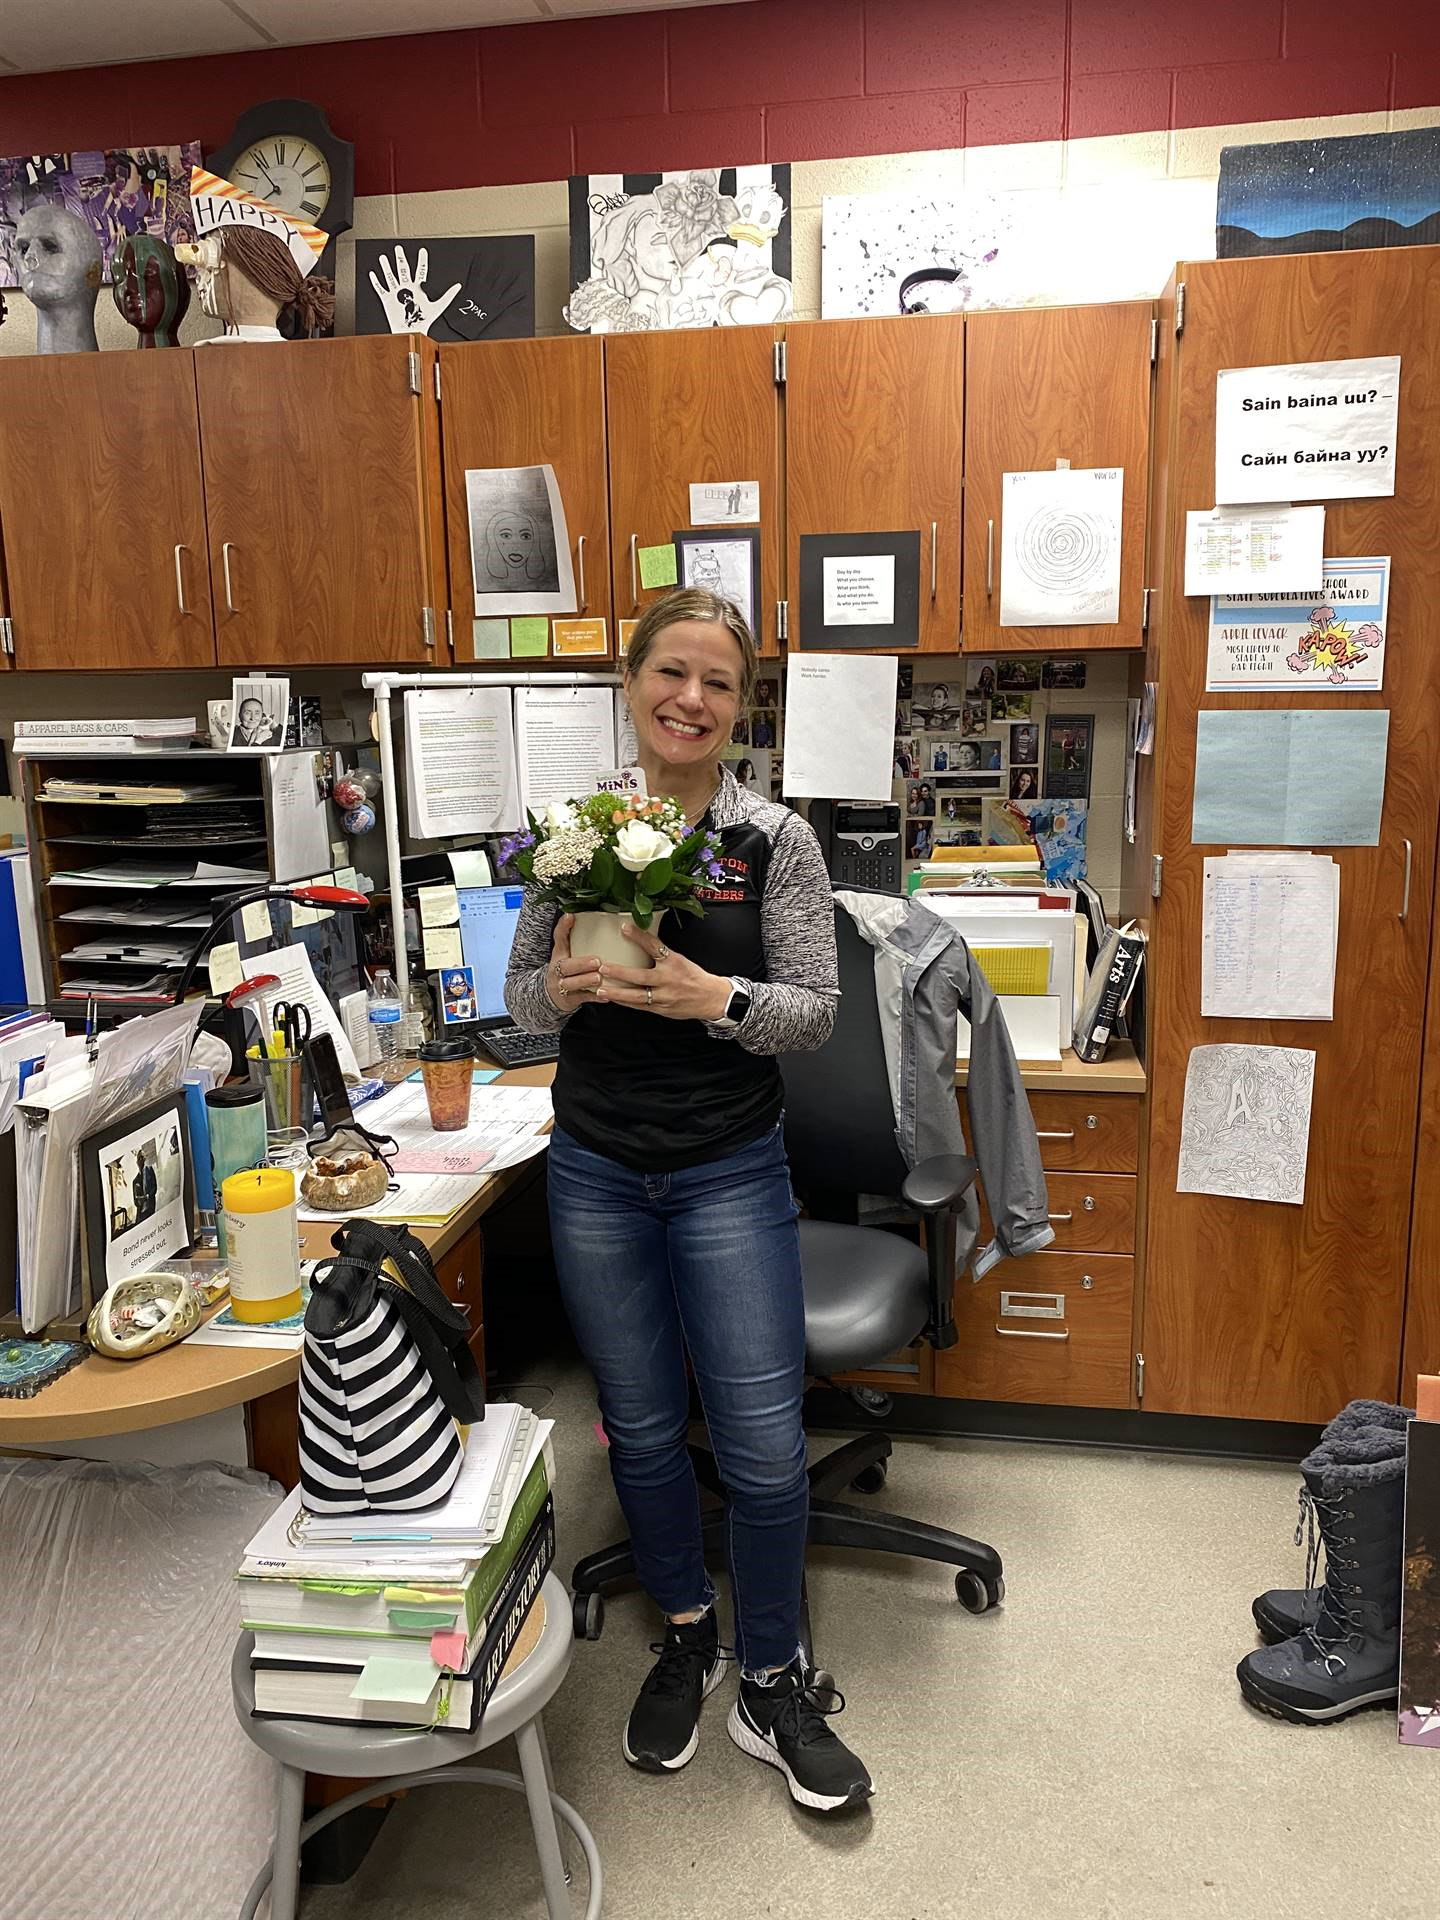 Mrs. Levack Named Teacher of the Year at NHS!